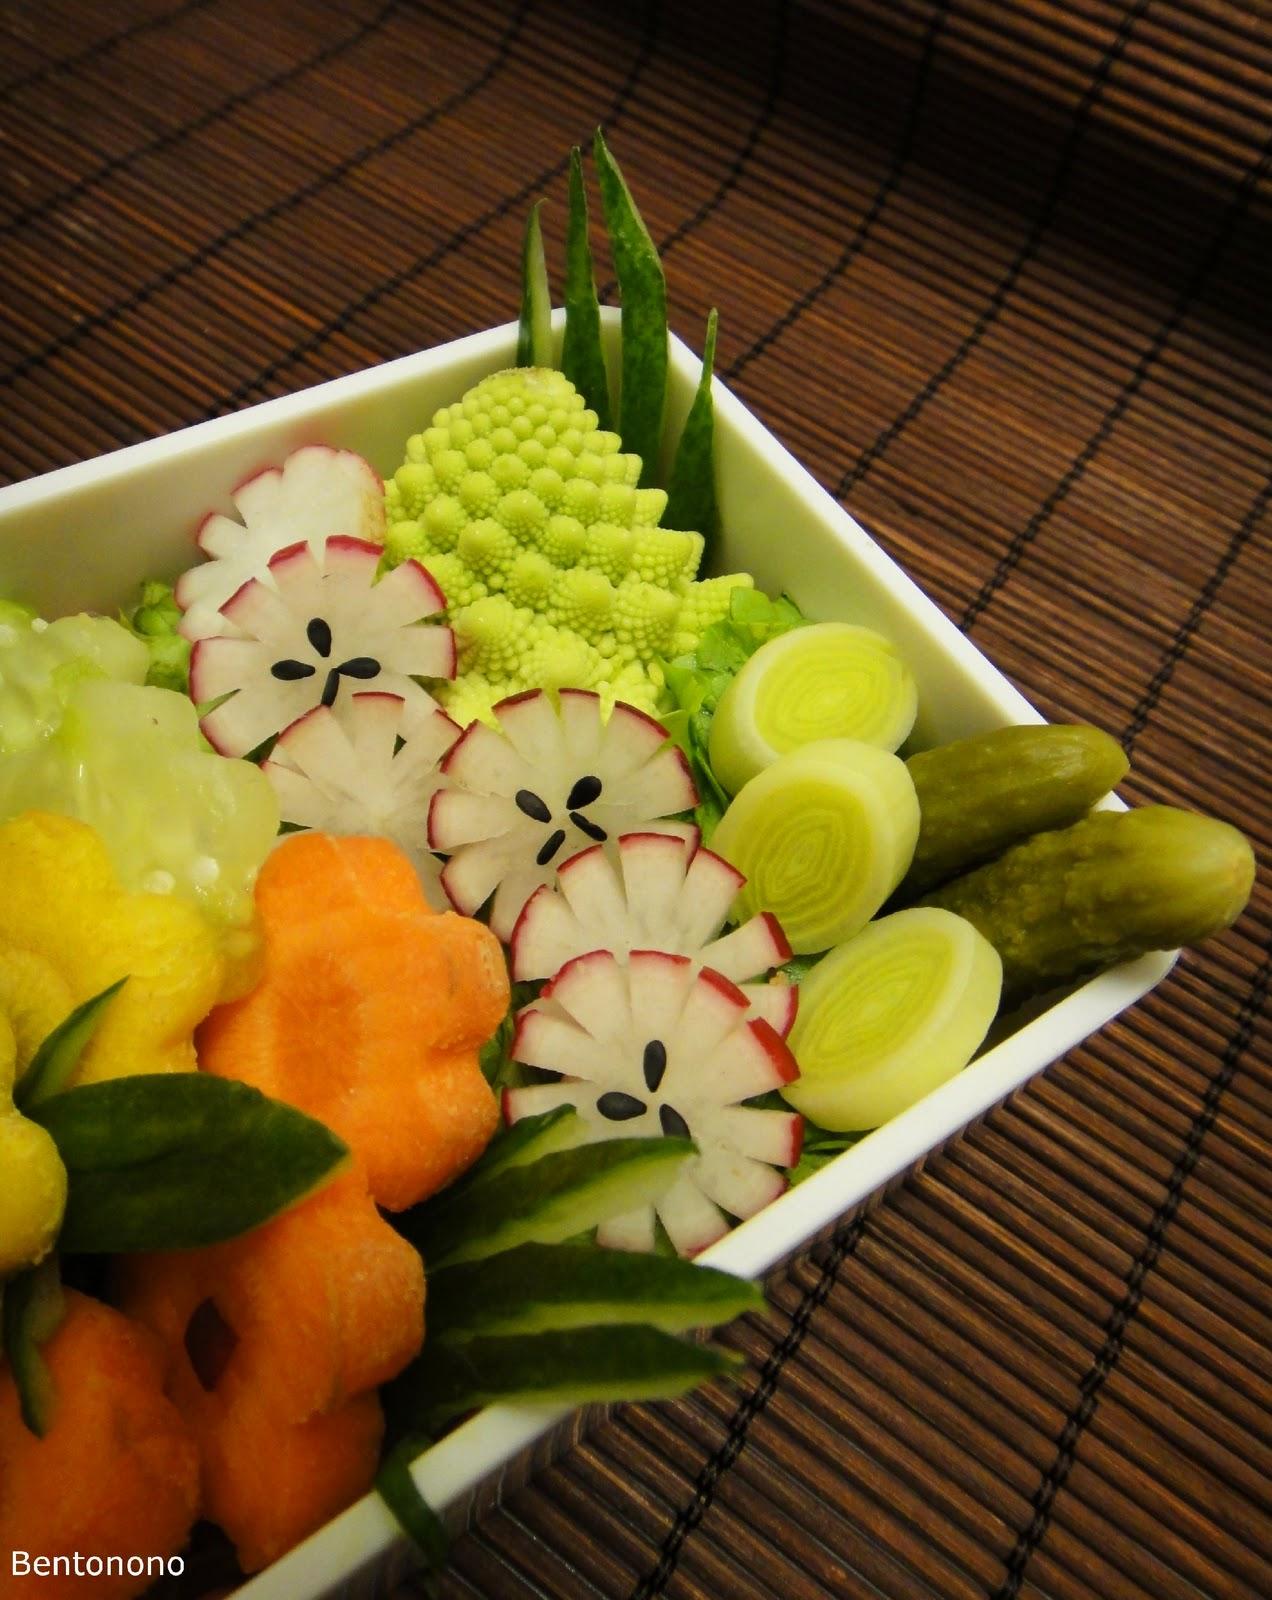 Bento nono bento potager - Accompagnement salade verte ...